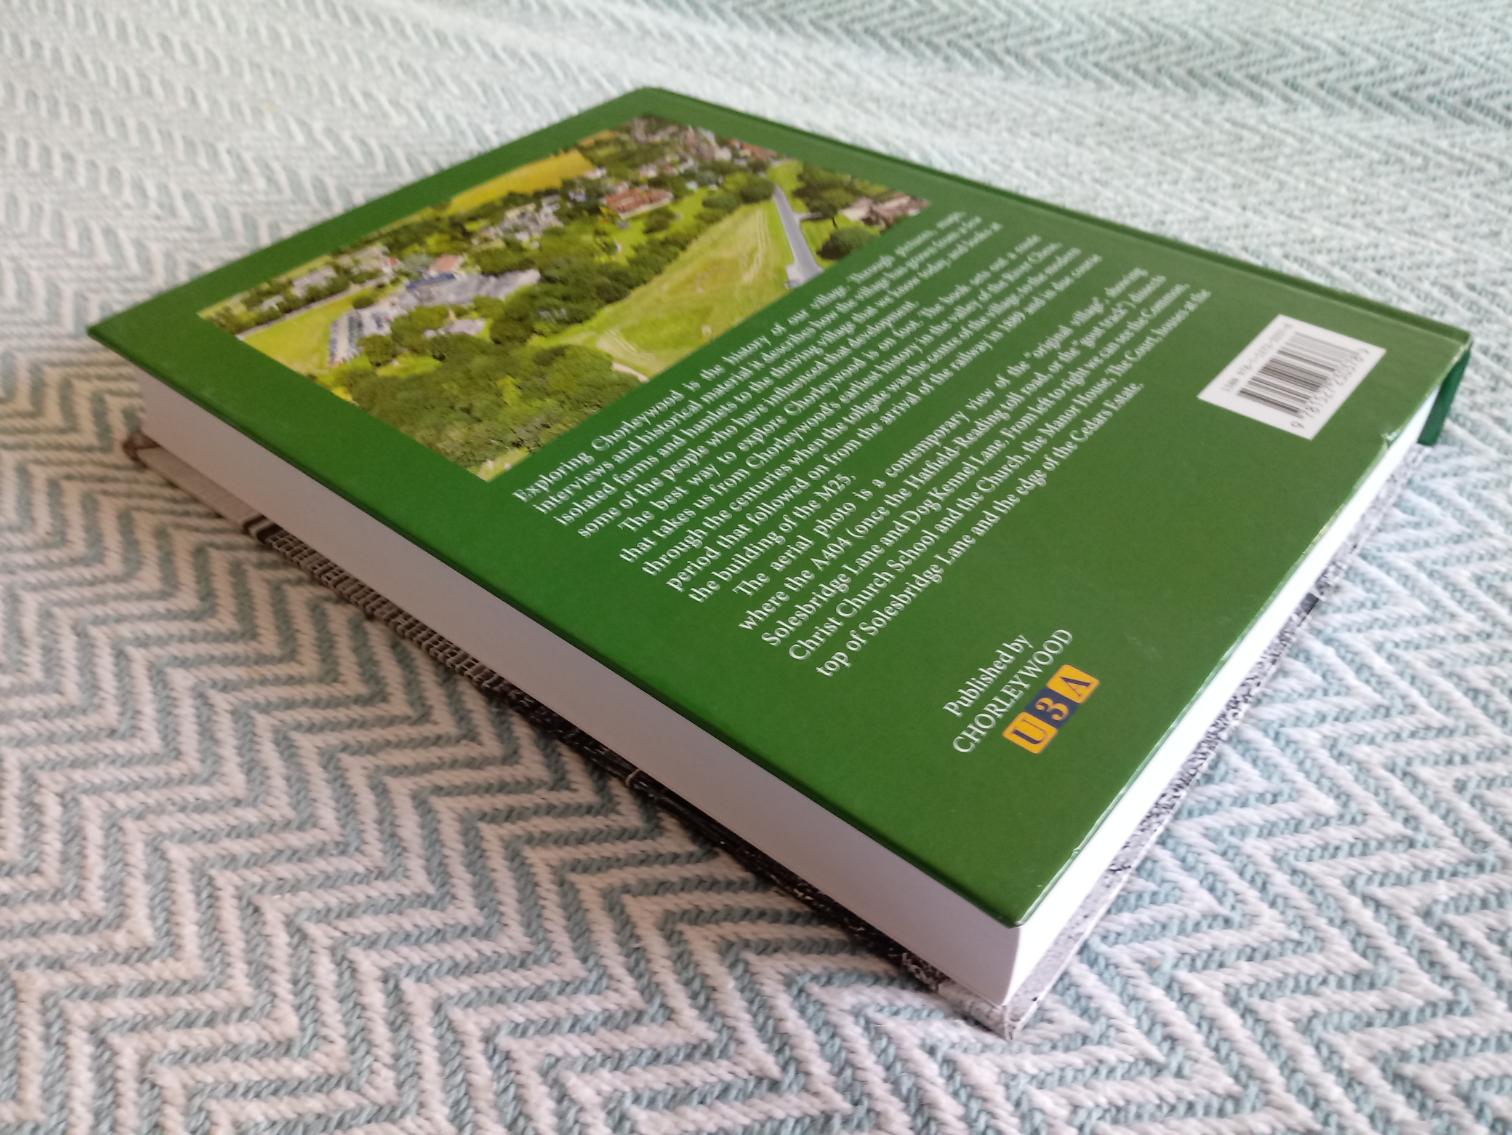 Exploring Chorleywood A Pictorial History by Members of Chorleywood U3A Sue Clark, David - Image 2 of 3